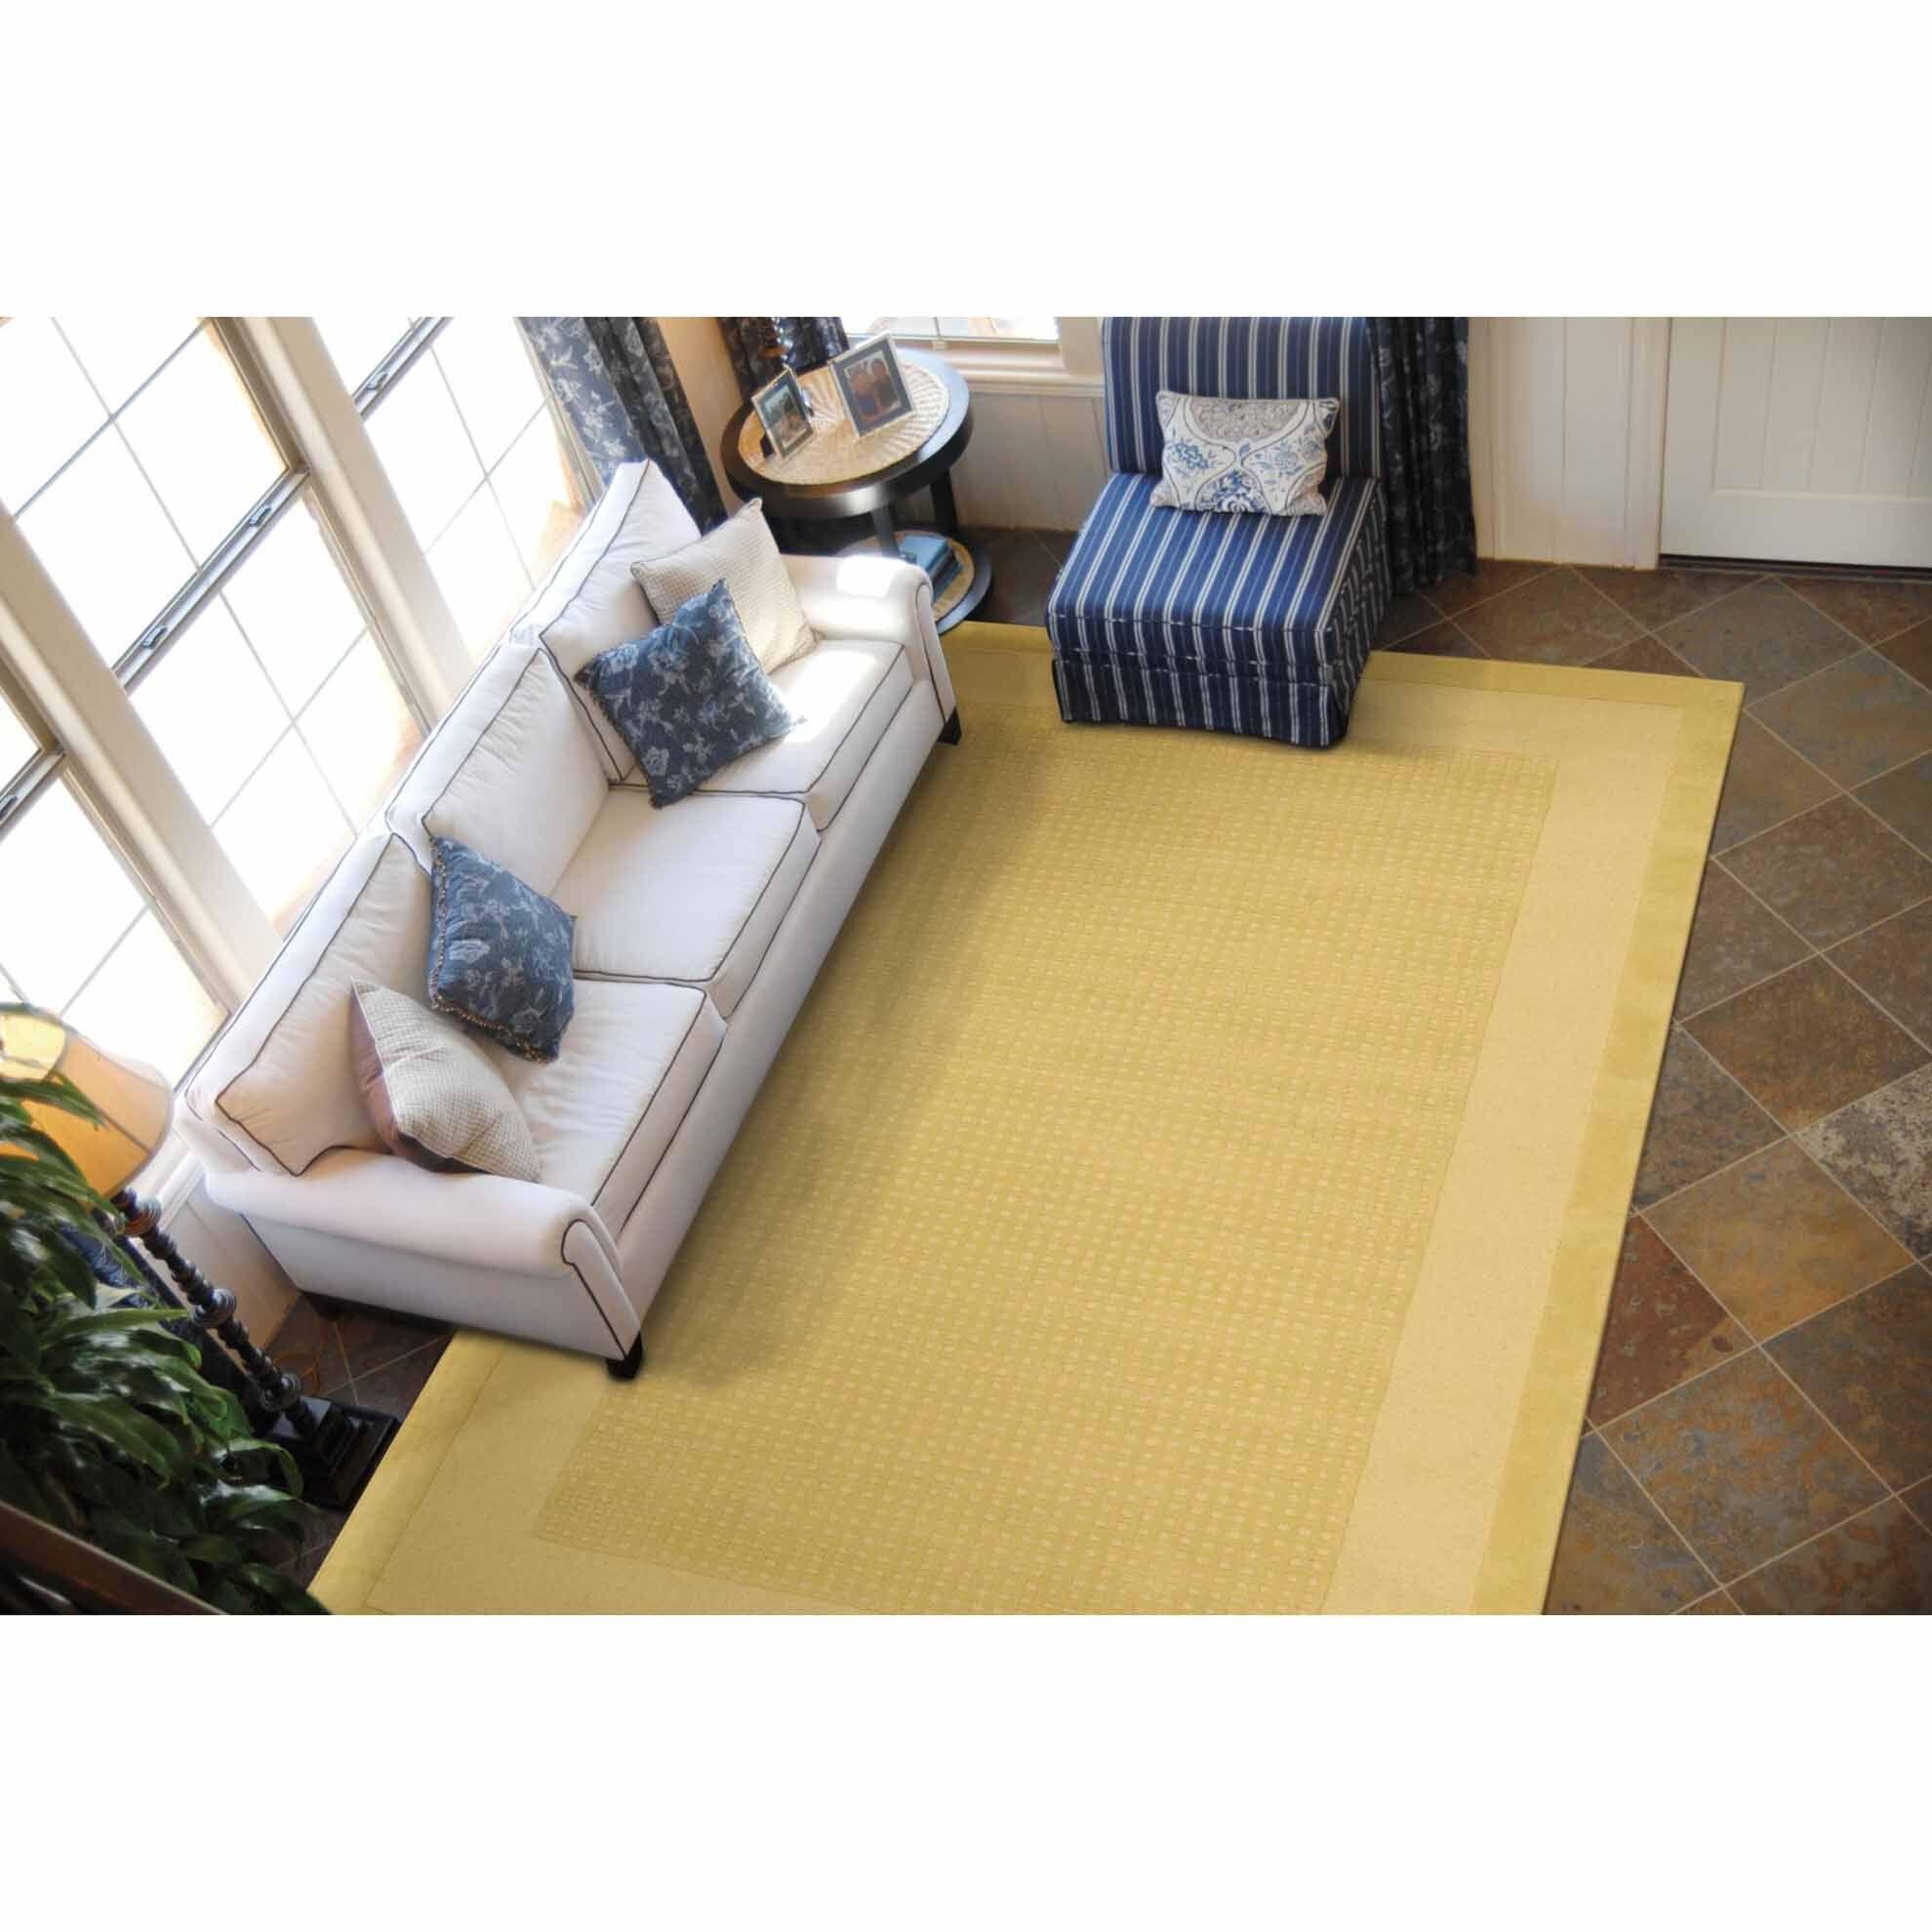 Aspasia Yellow Area Rug Rug Size: Rectangle 8' x 10'6